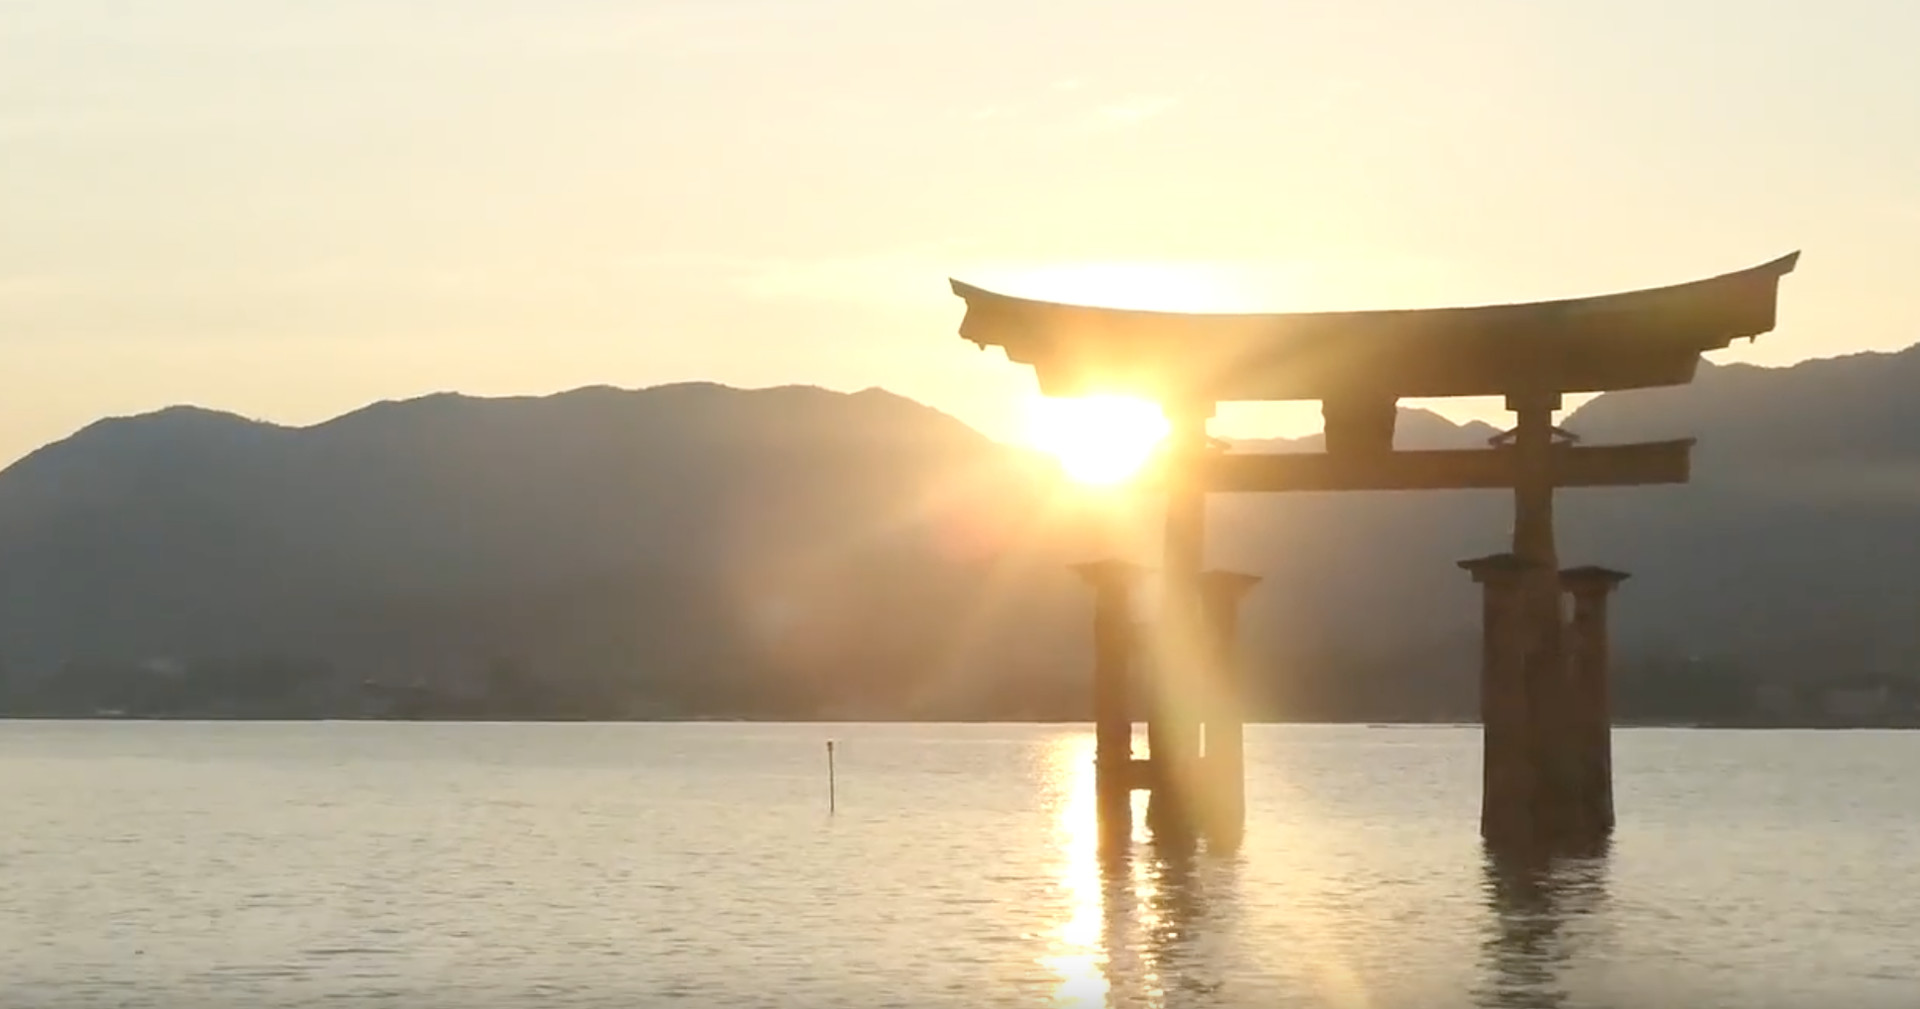 Mes endroits coups de coeurs au Japon (1/2) : à Kyoto, Nikko, Hiroshima, Miyajima...